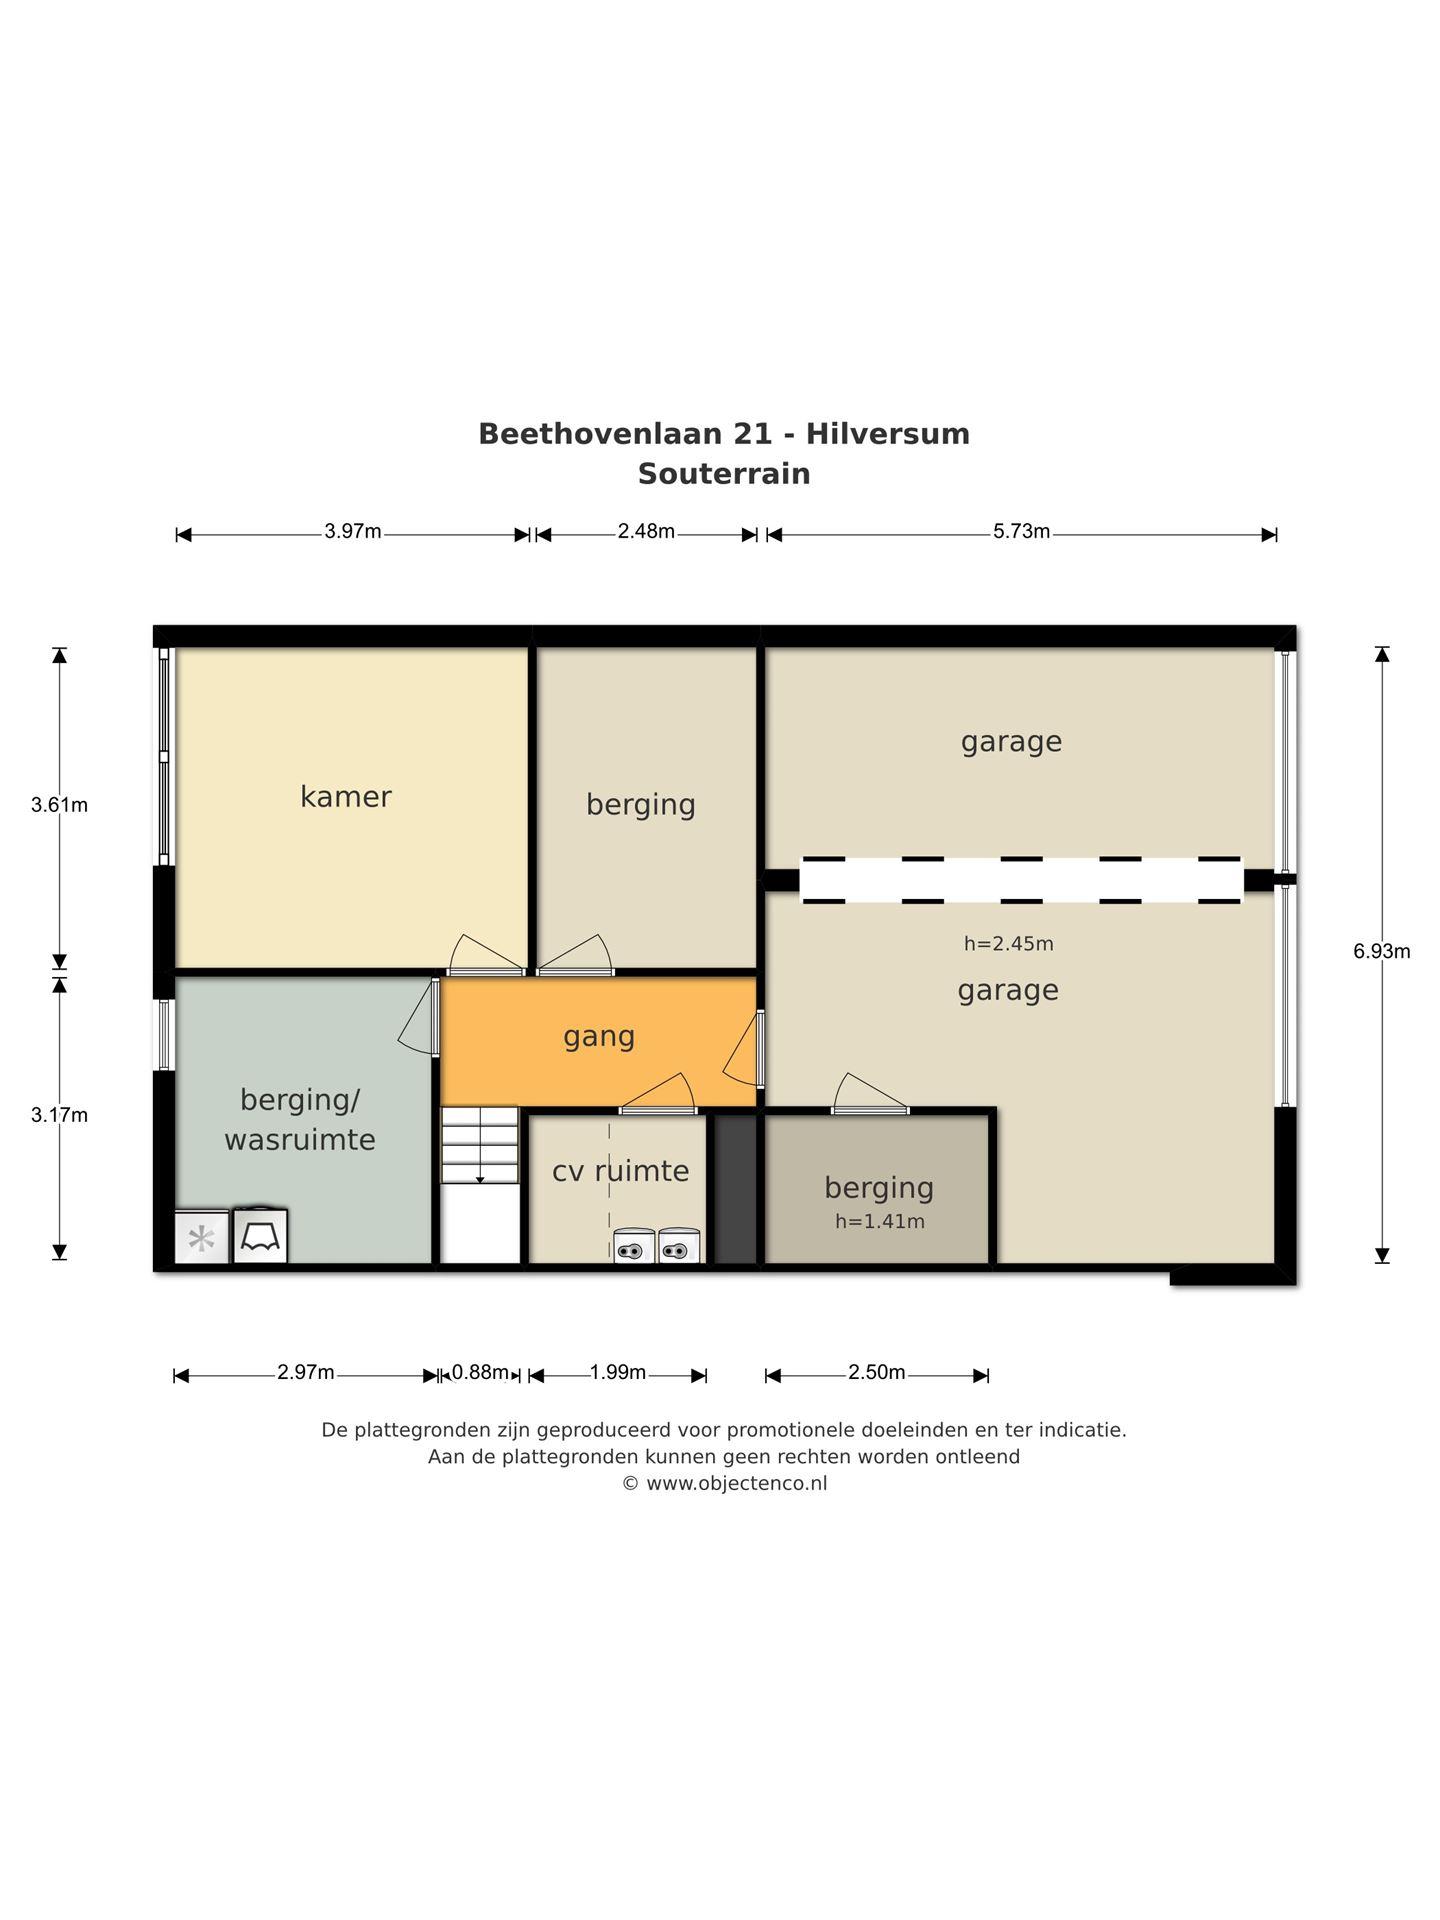 Beethovenlaan, Hilversum